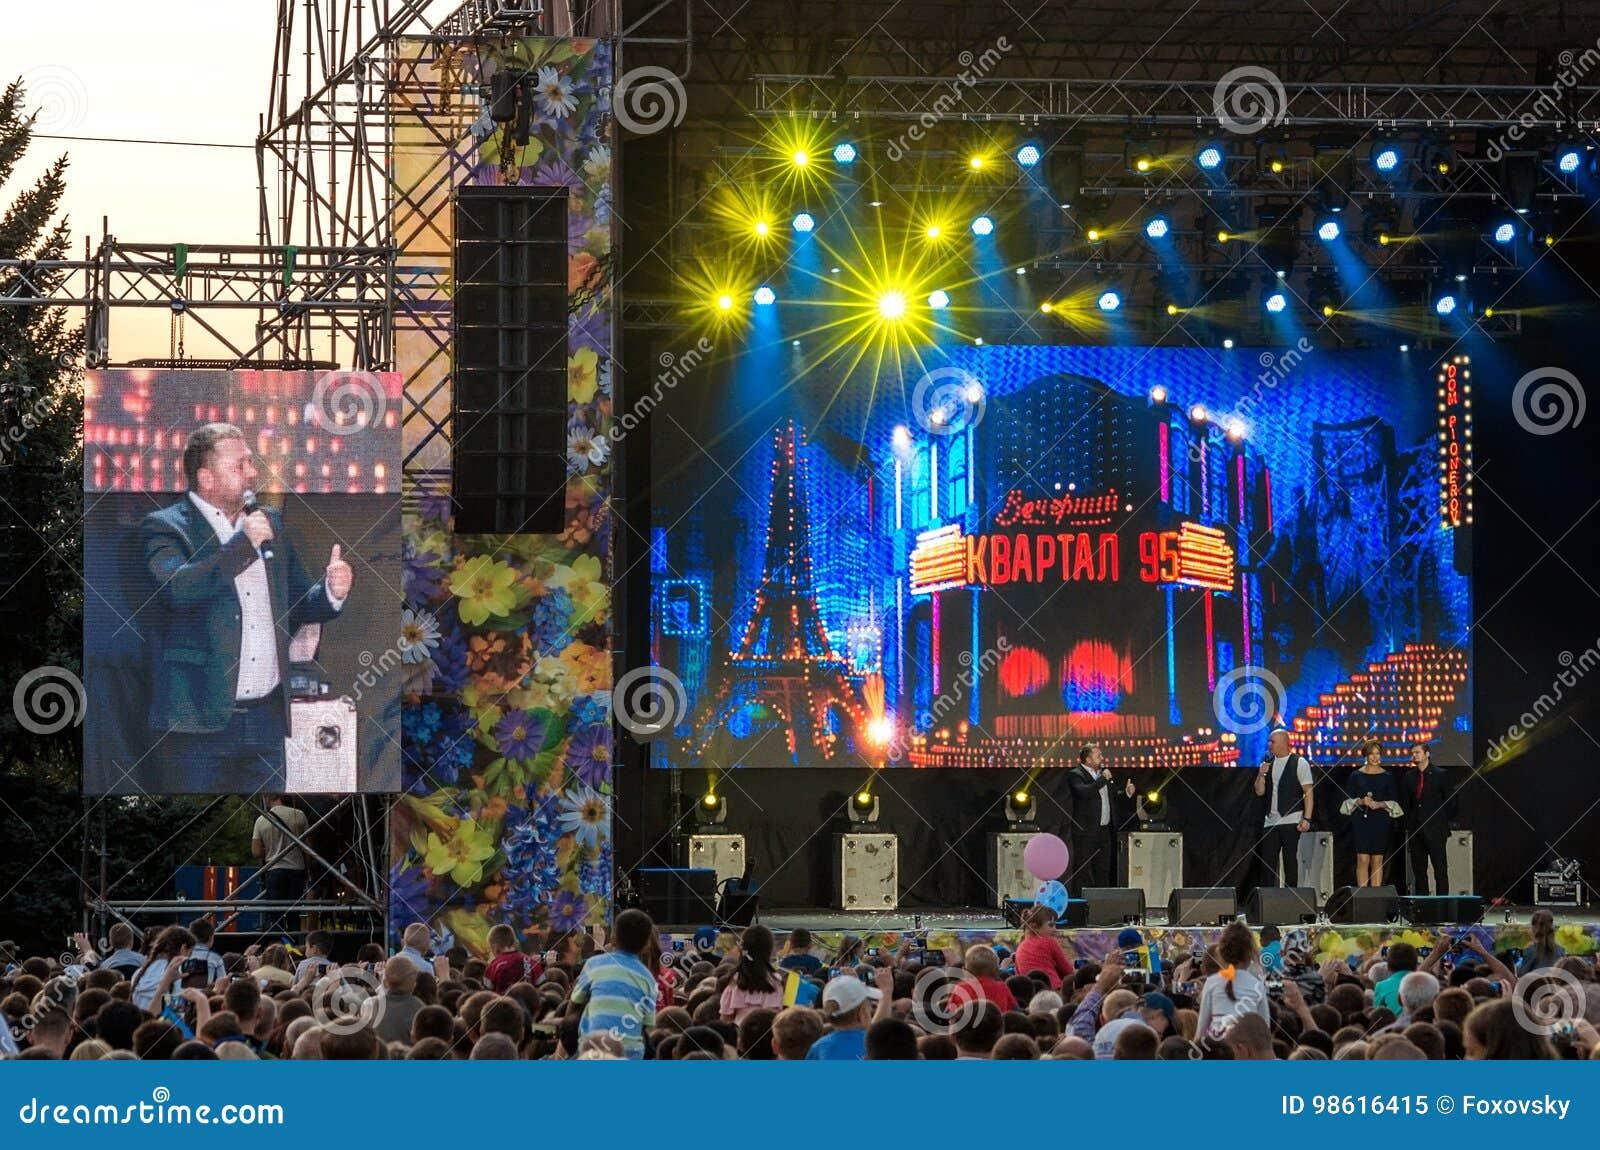 95 Kvartal Comes To Kramatorsk Ukraine With New Show